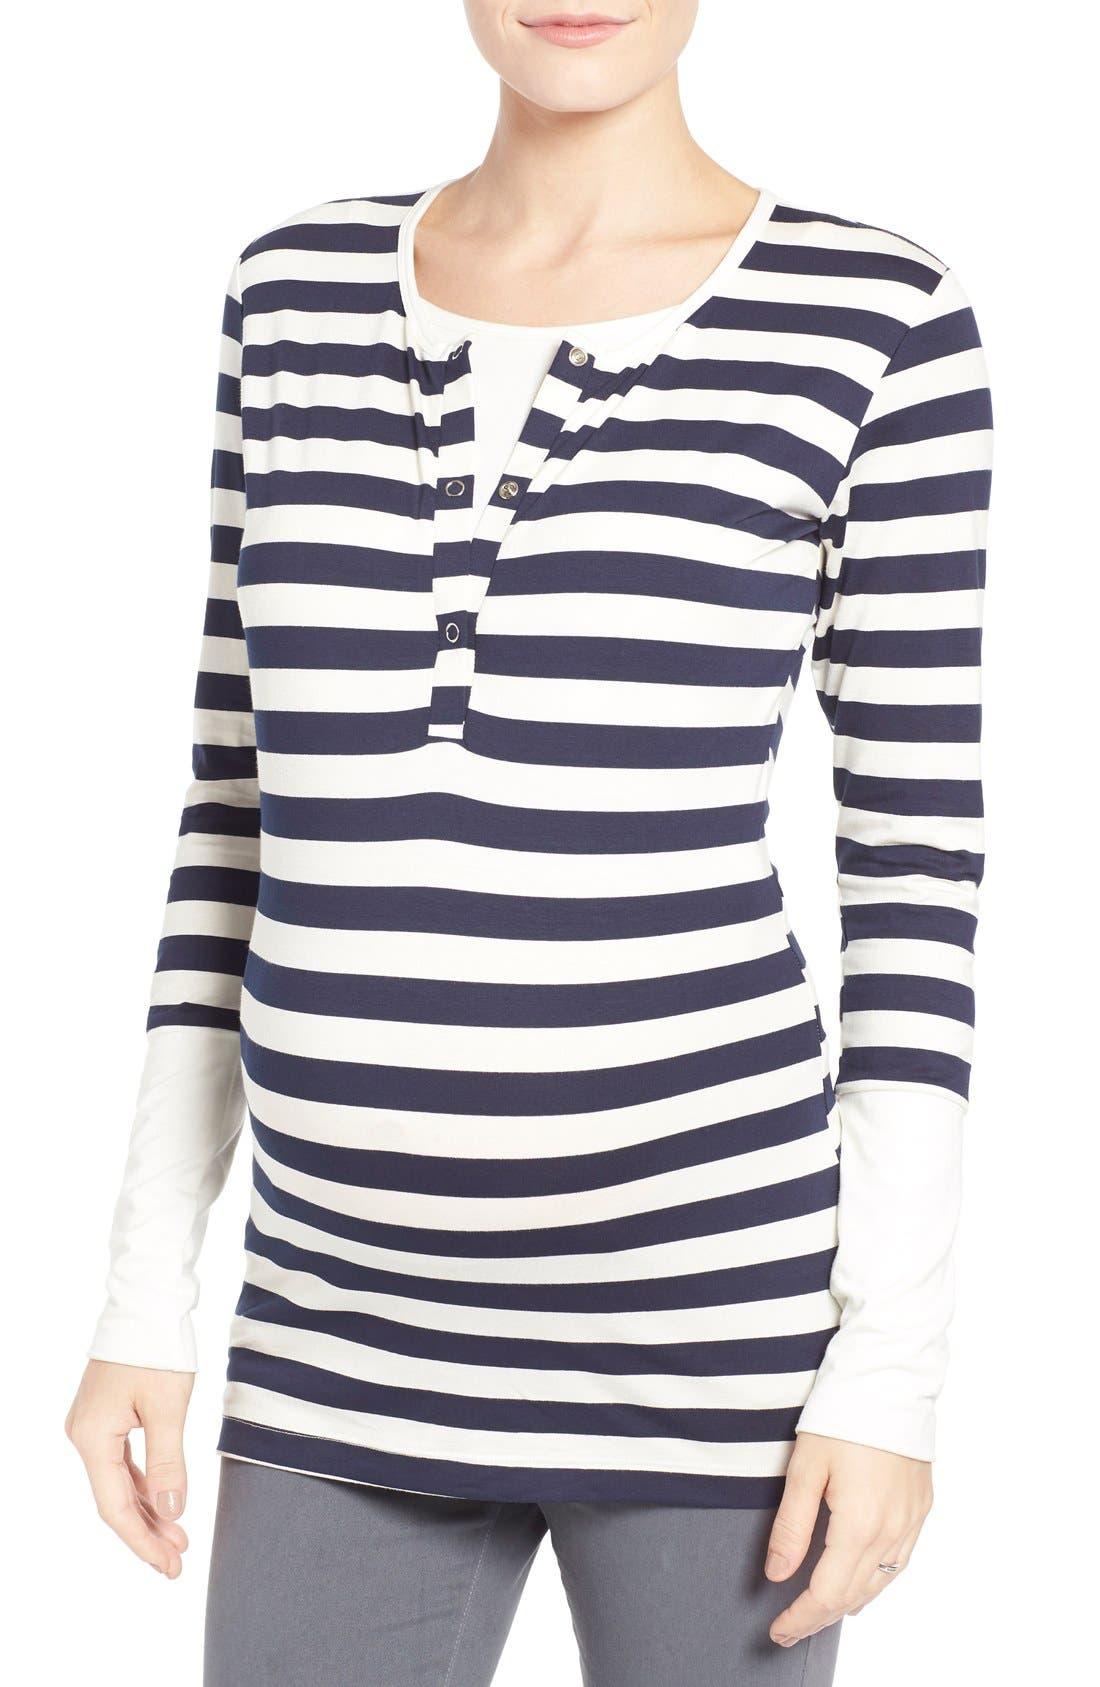 'Jenn' Nursing Top,                         Main,                         color, Navy Stripe With Cream Cuff